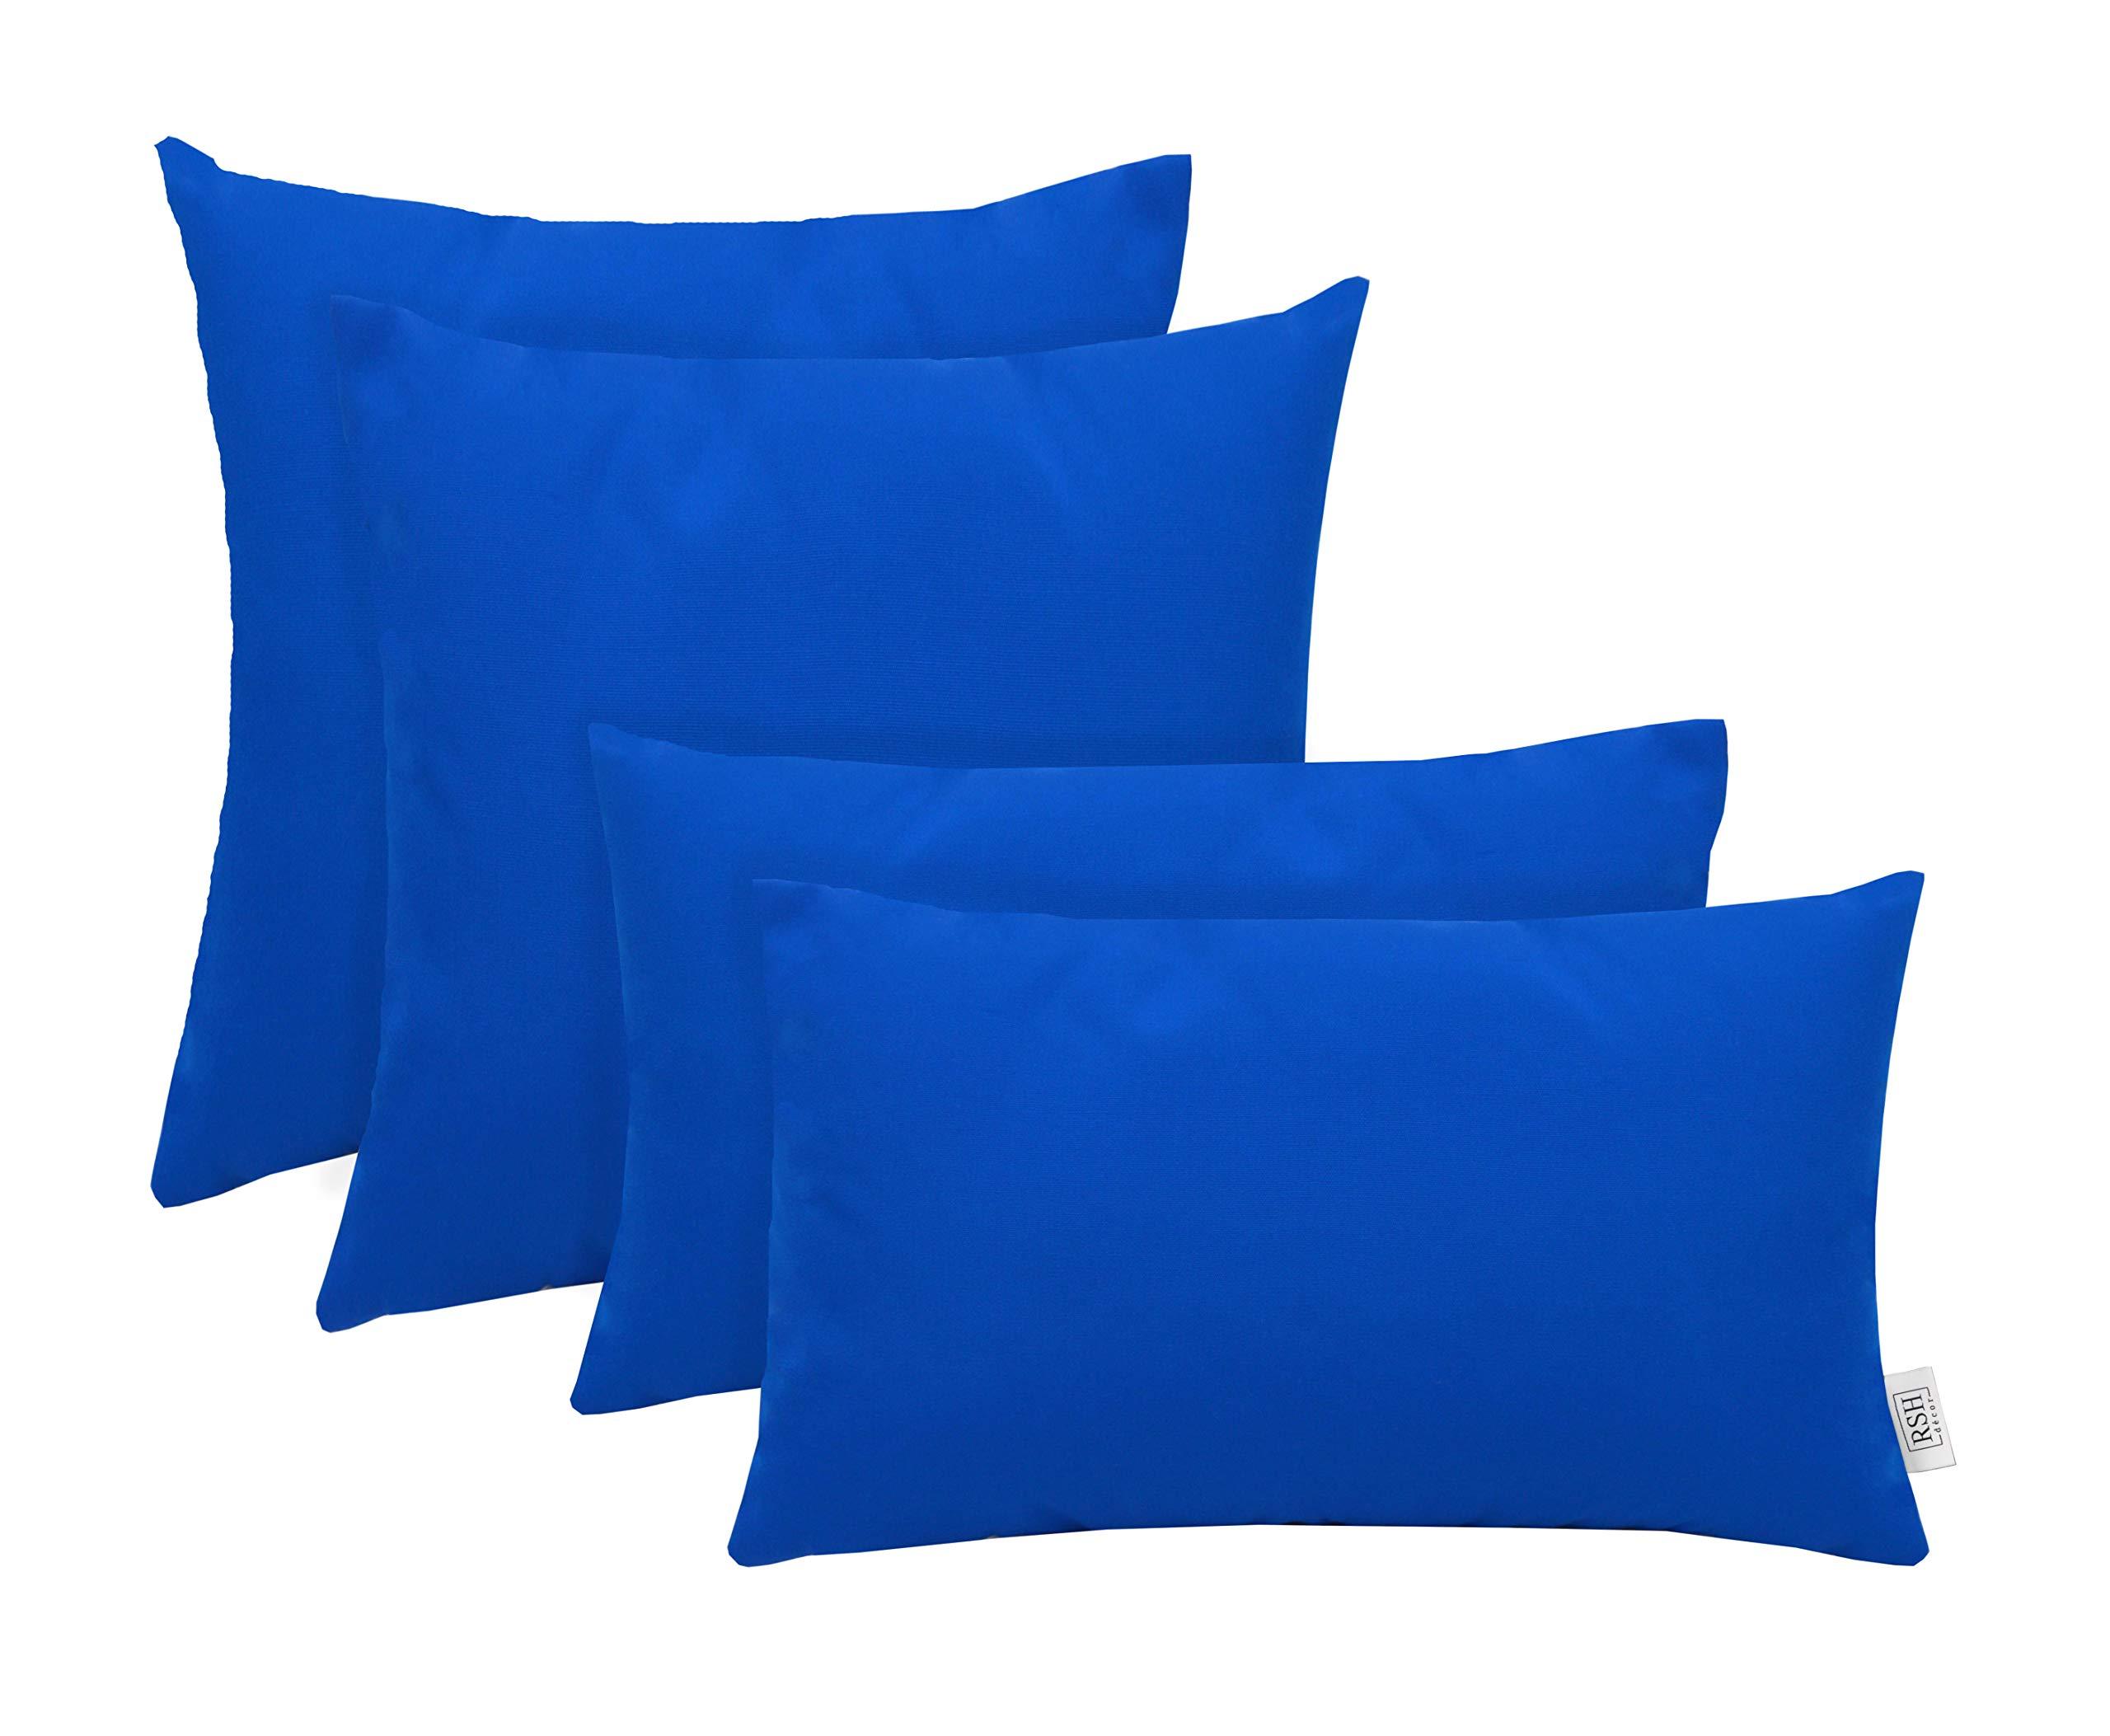 RSH Décor Set of 4 Indoor/Outdoor Square & Rectangle Lumbar Throw Pillows Sunbrella Canvas Pacific Blue (20'' x 12'' & 17'' x 17'')